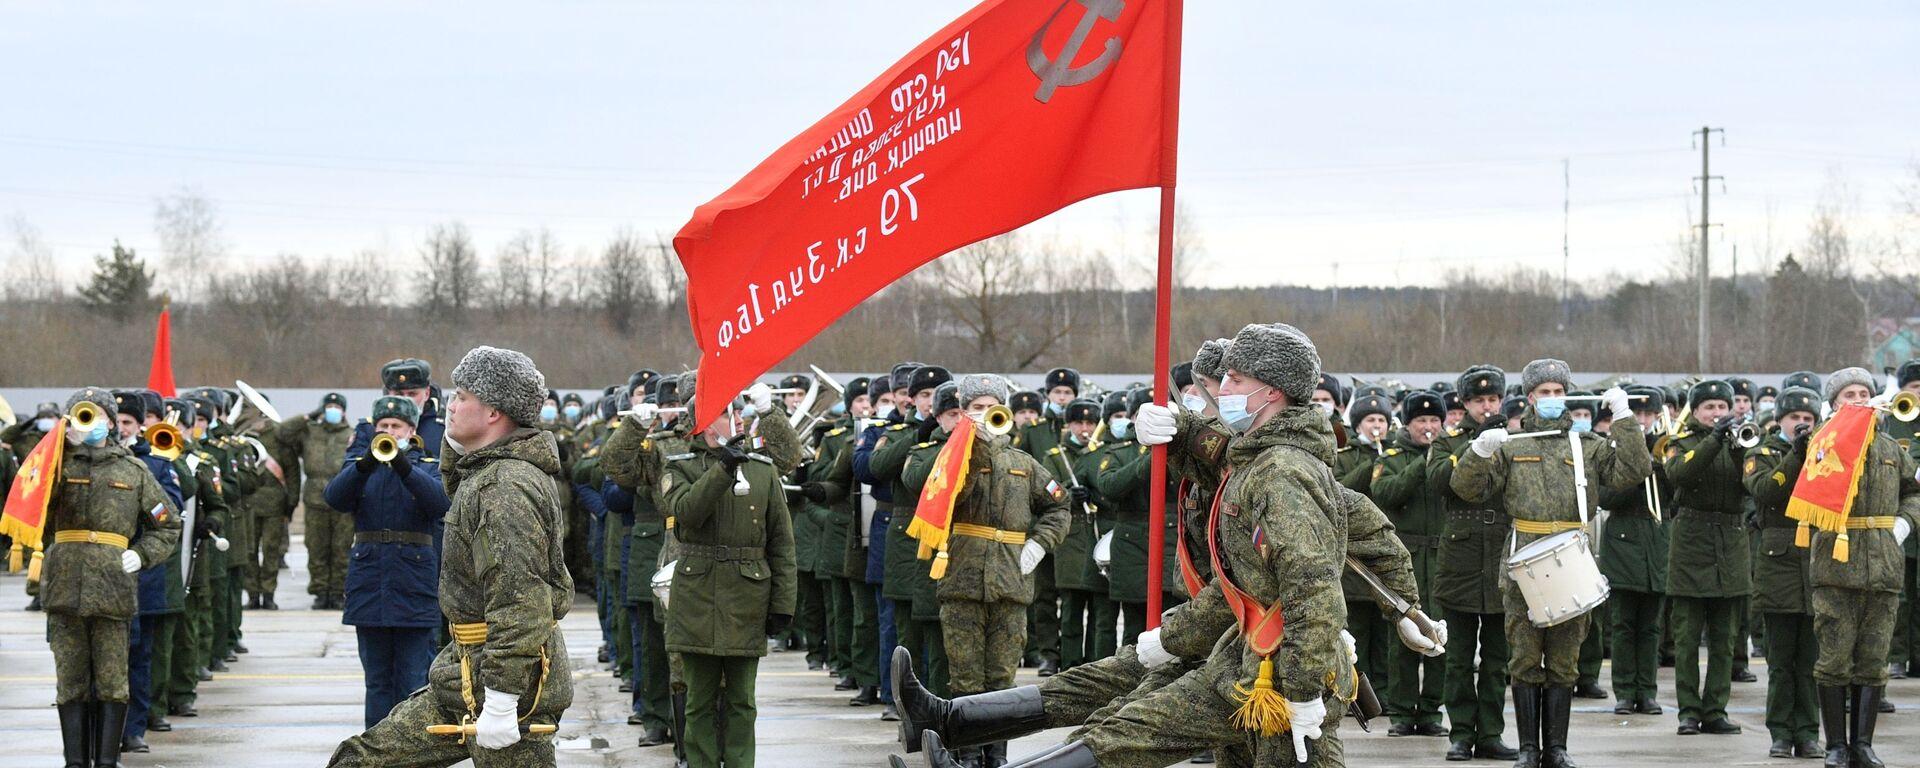 Репетиция парада Победы в Алабино - Sputnik Латвия, 1920, 27.04.2021